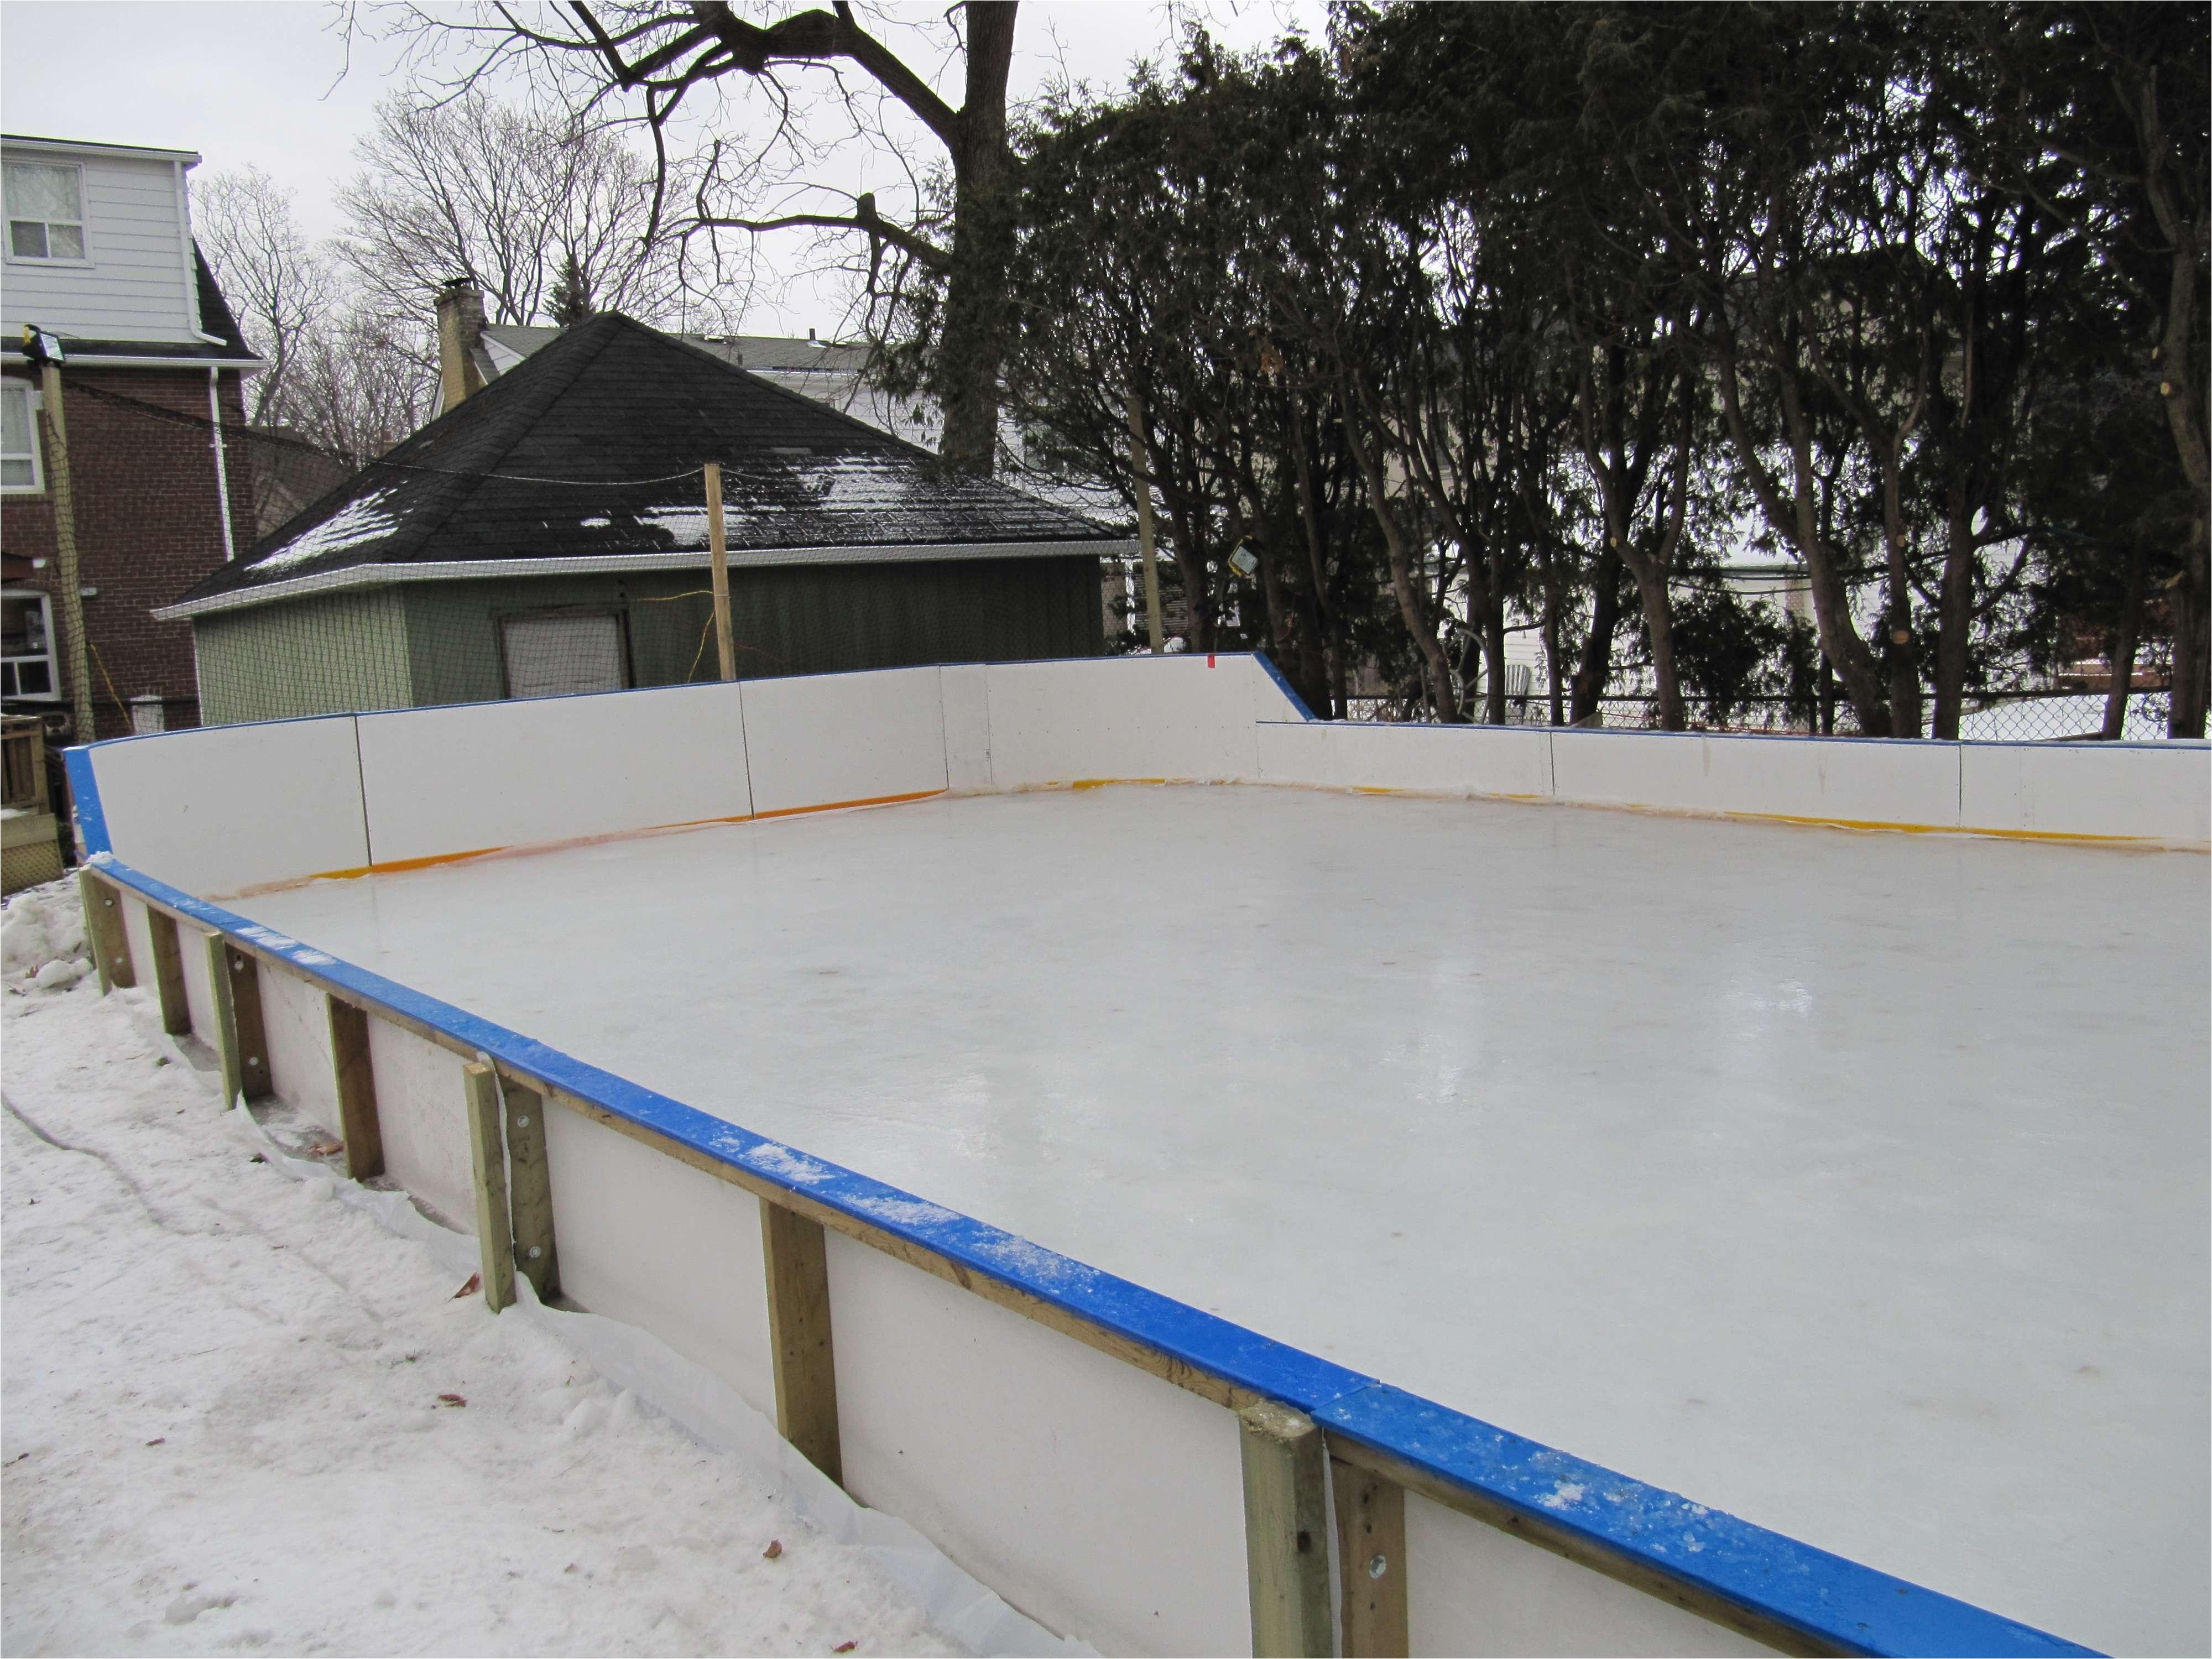 a backyard ice rink zamboni lovely backyard ice rink kits emiliesbeauty of a backyard ice rink